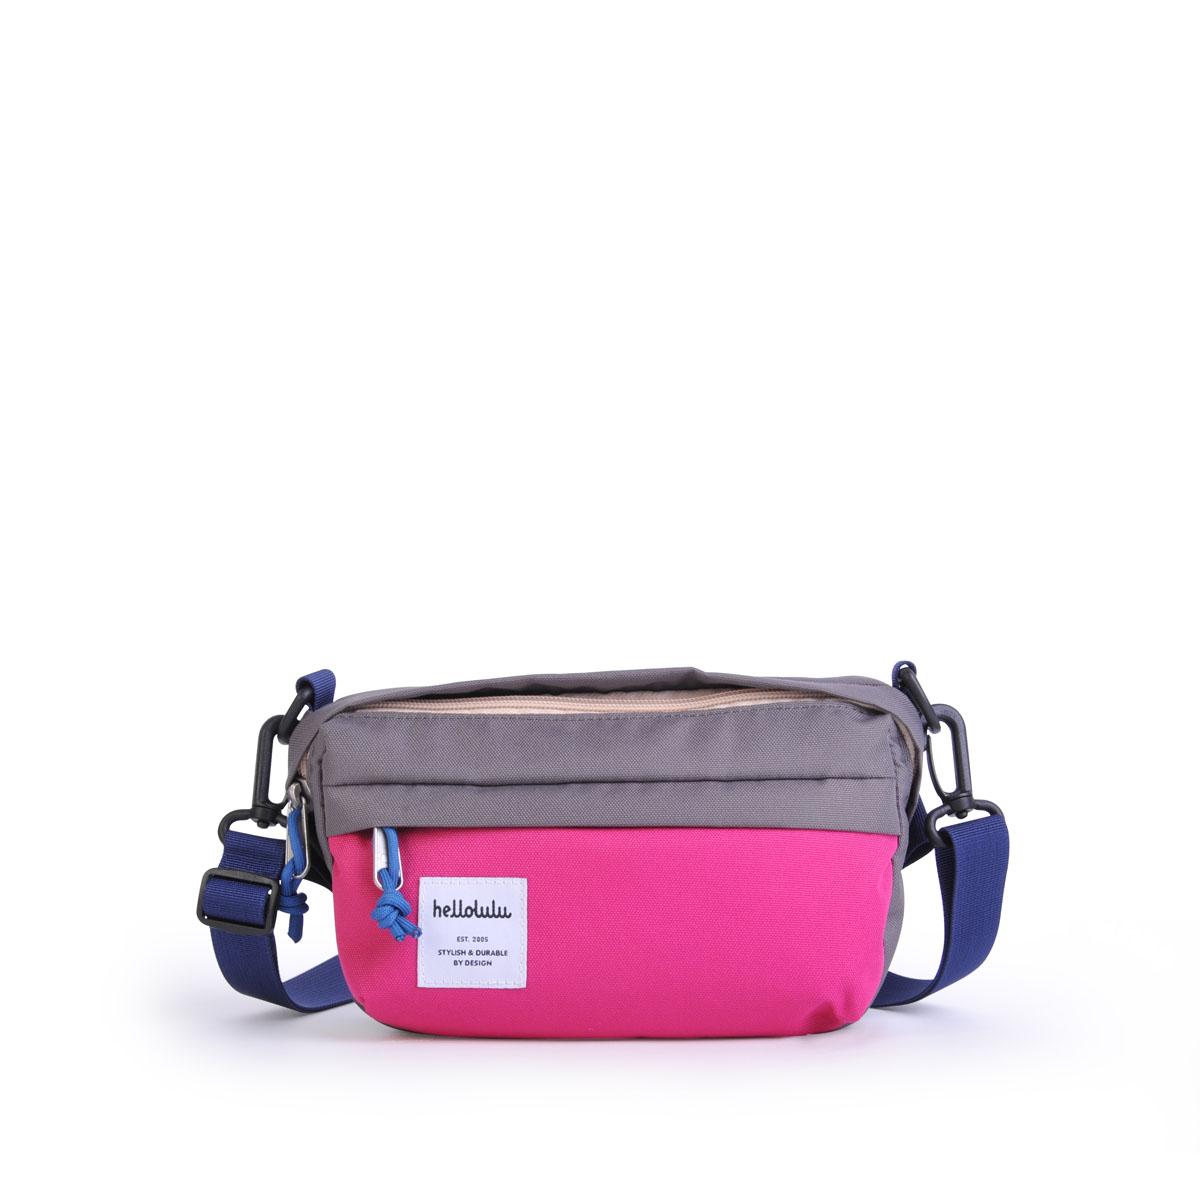 Hellolulu รุ่น HOLLIS - Gray/Pink